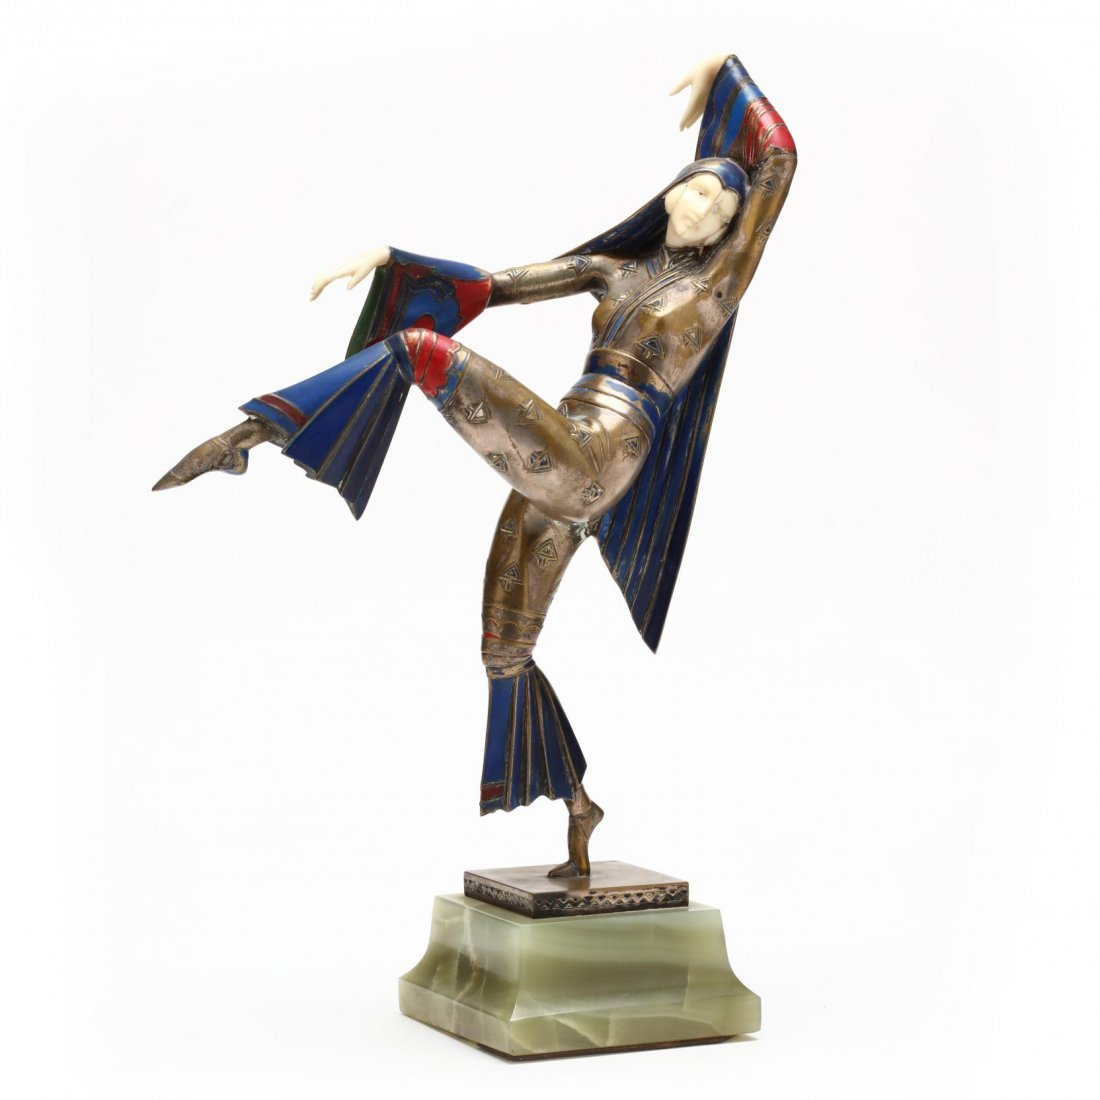 A Gerdago Cold-Painted Bronze & Ivory Dancer